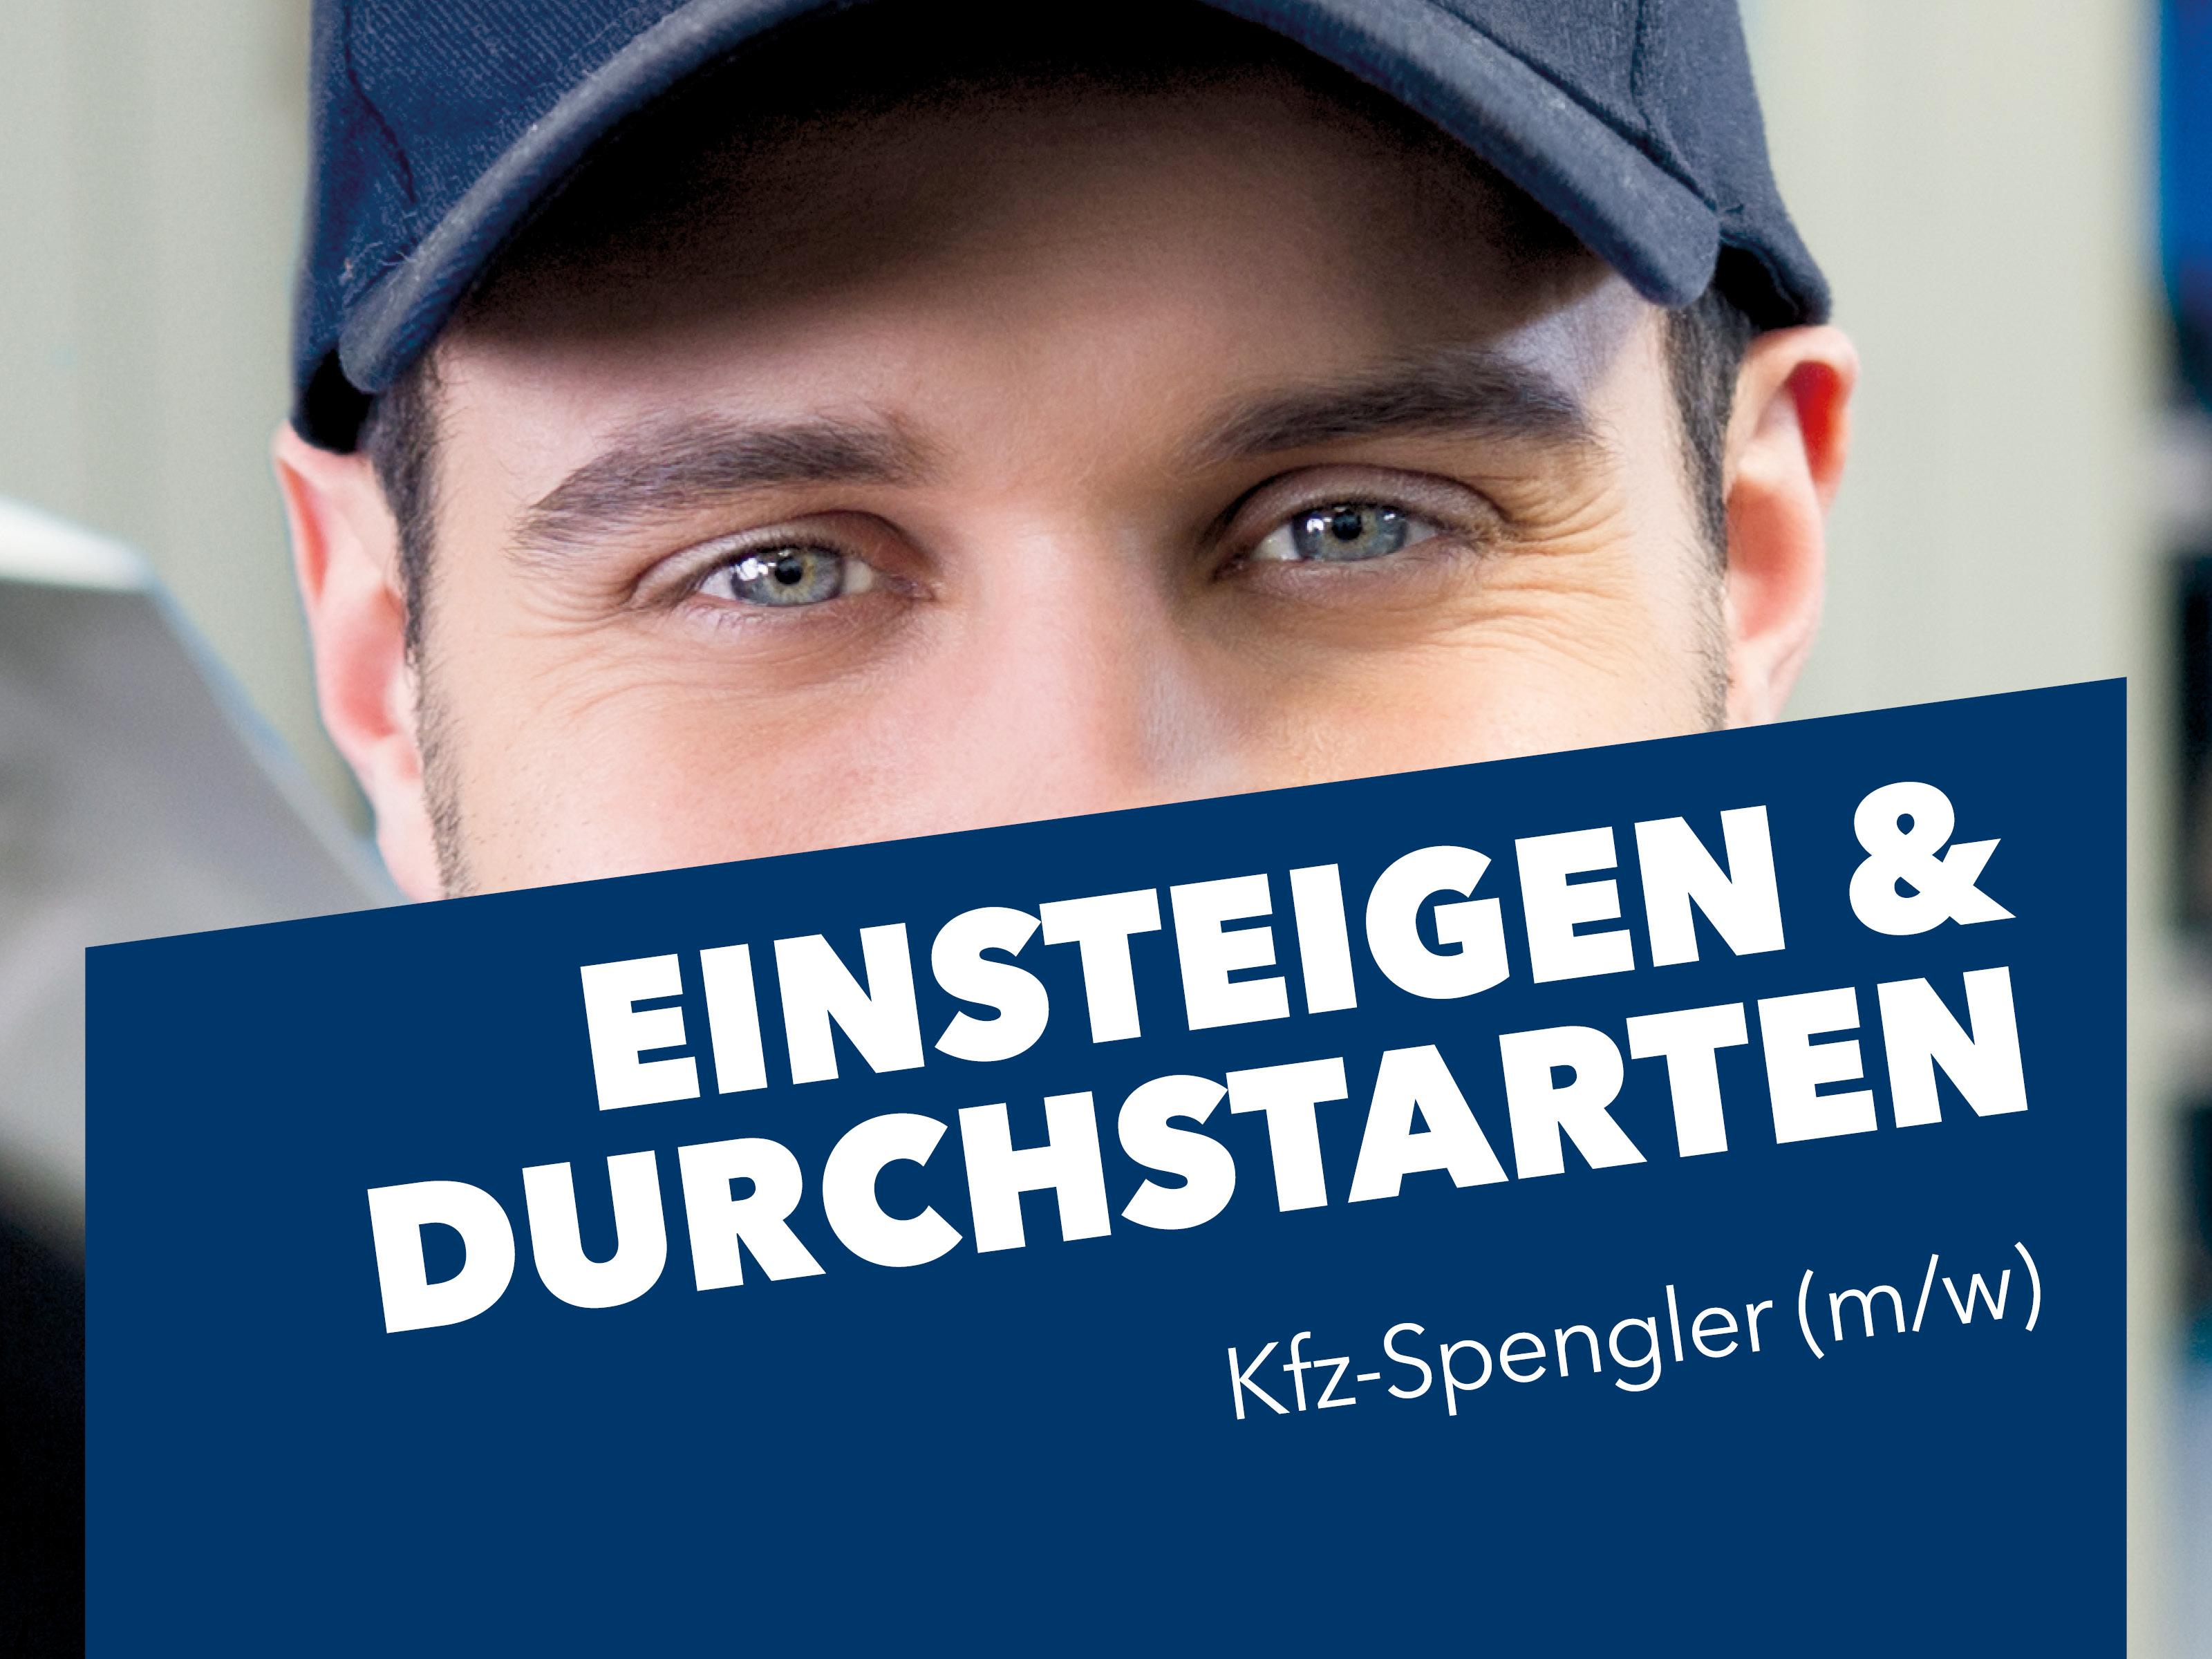 Kfz-Spengler (m/w) in Miesbach